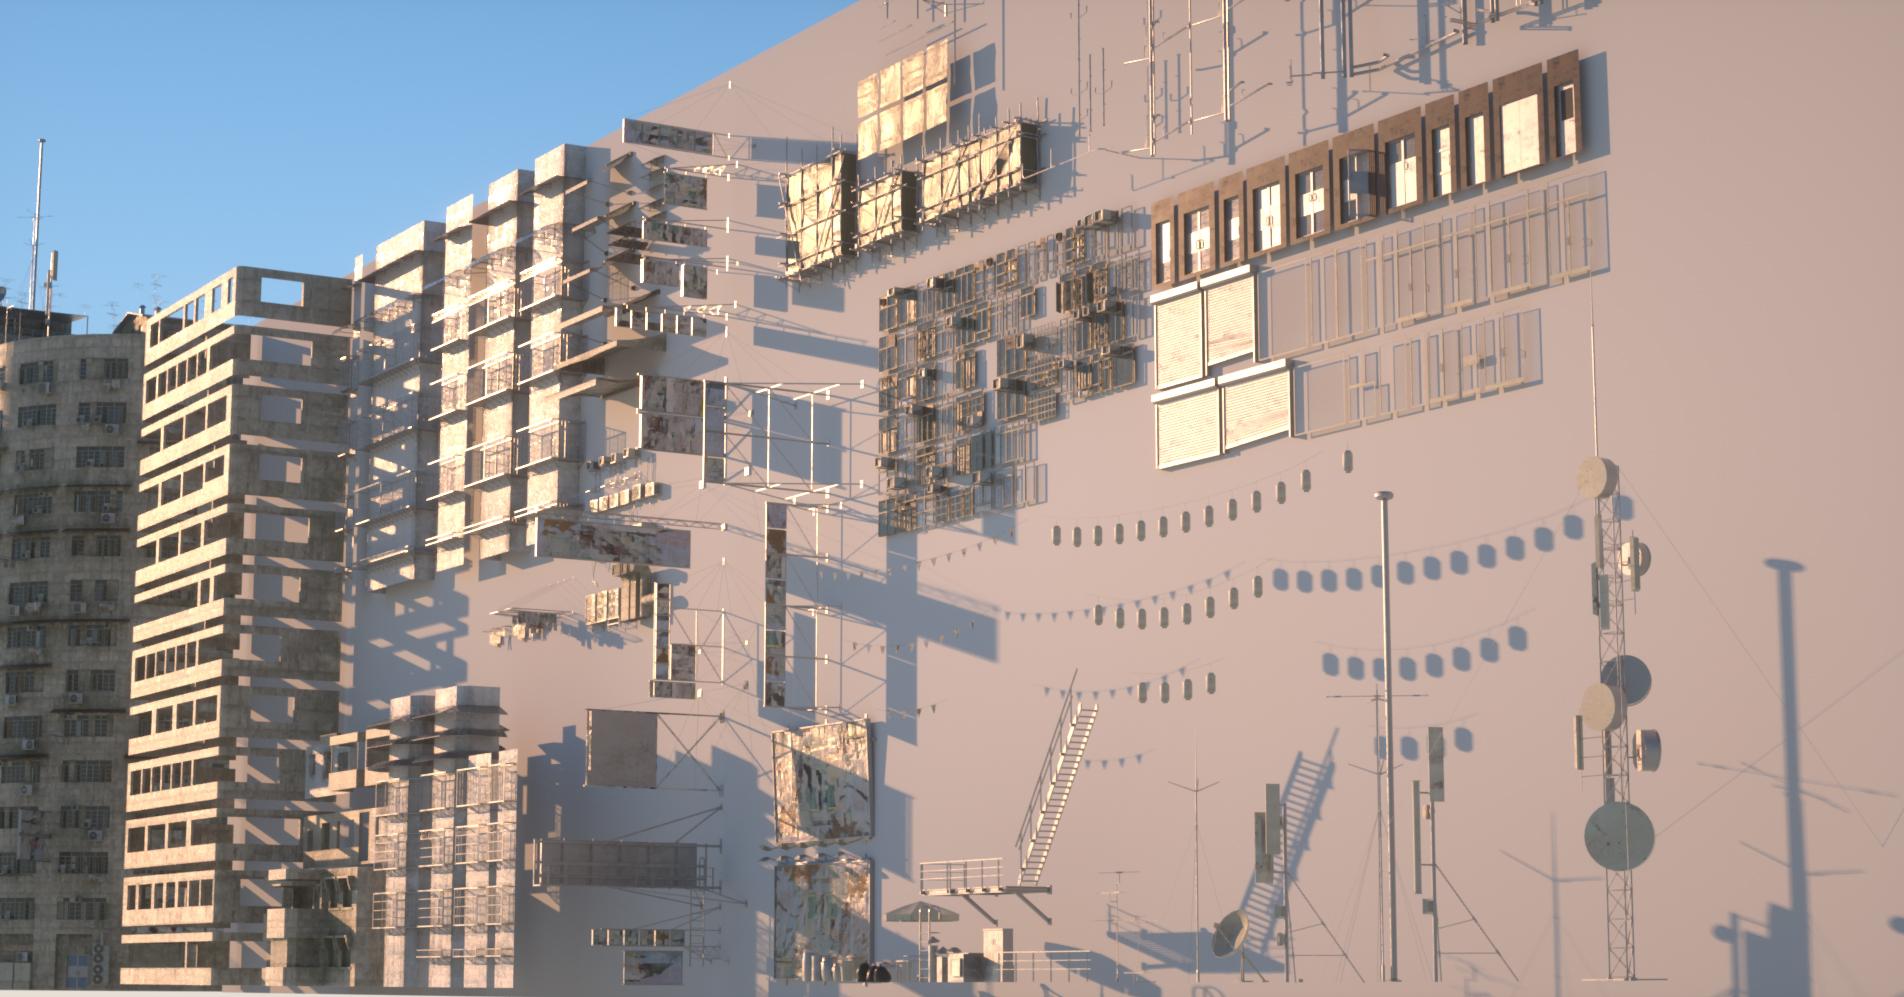 KitBash3d: The Future Slums Kit - ArtStation Magazine